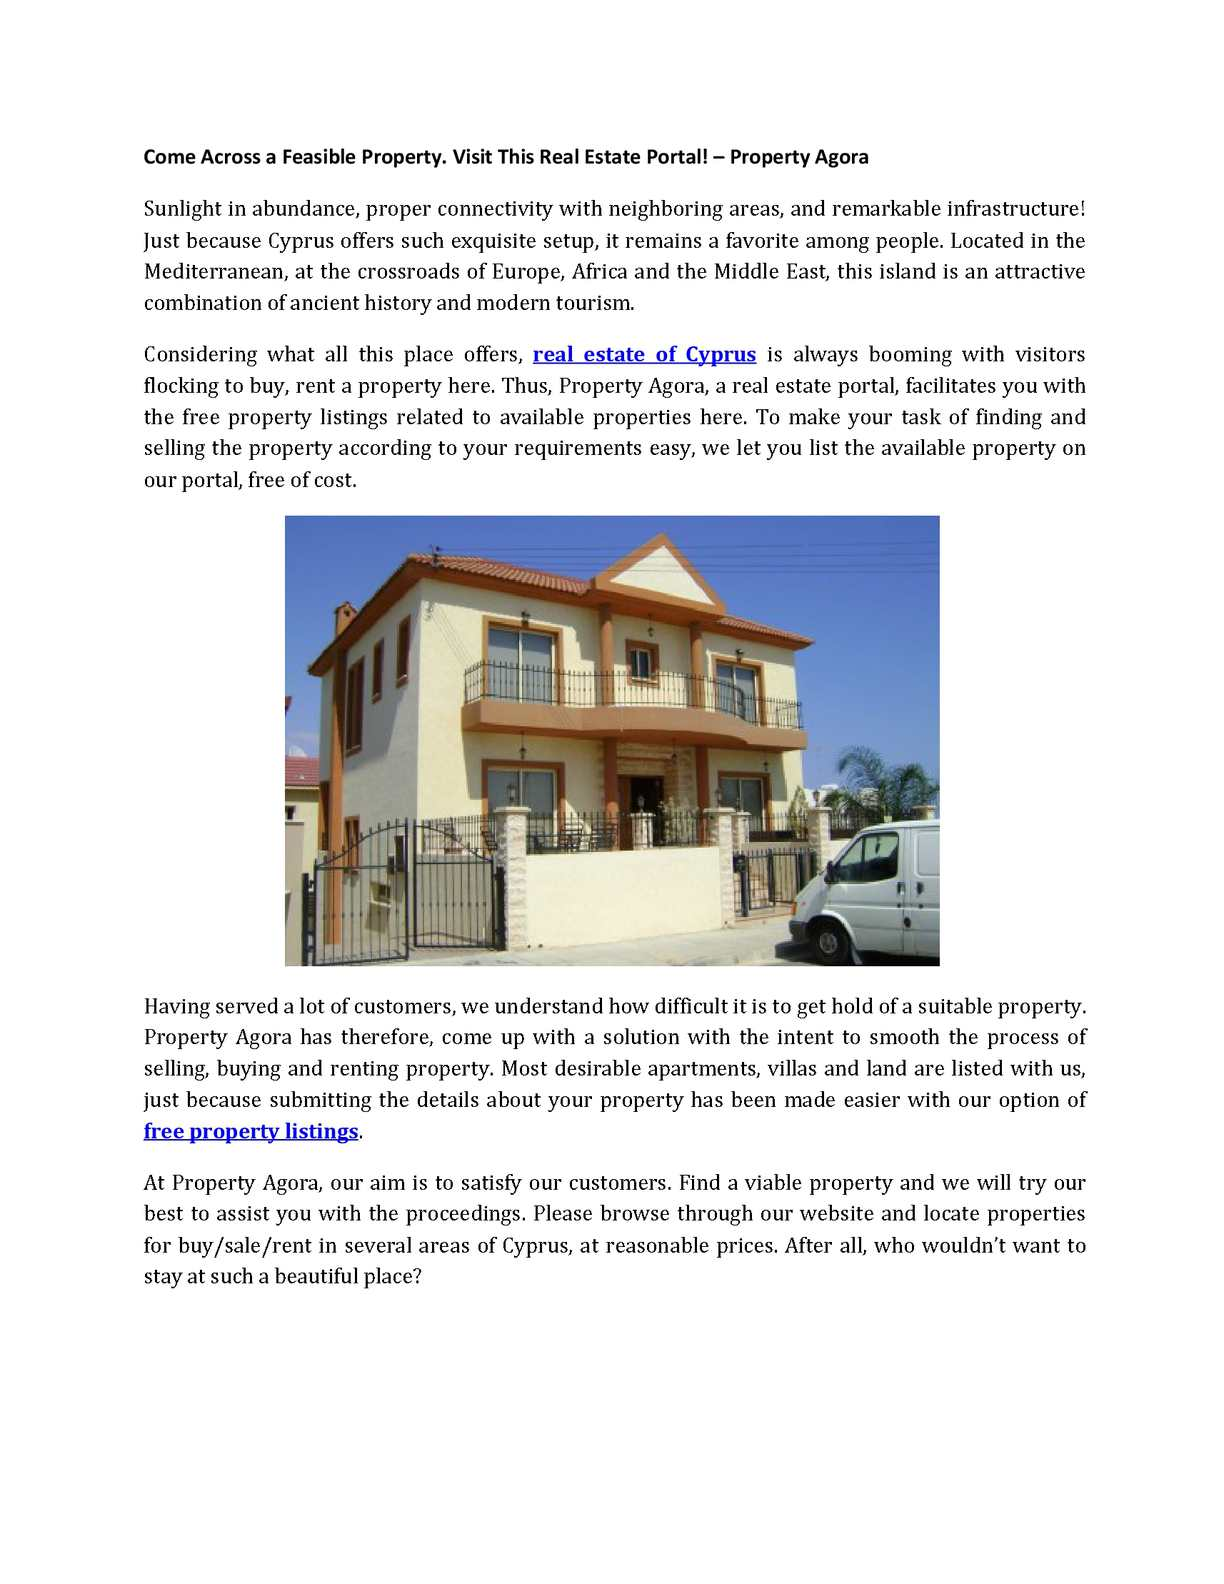 free property listings - Maco palmex co